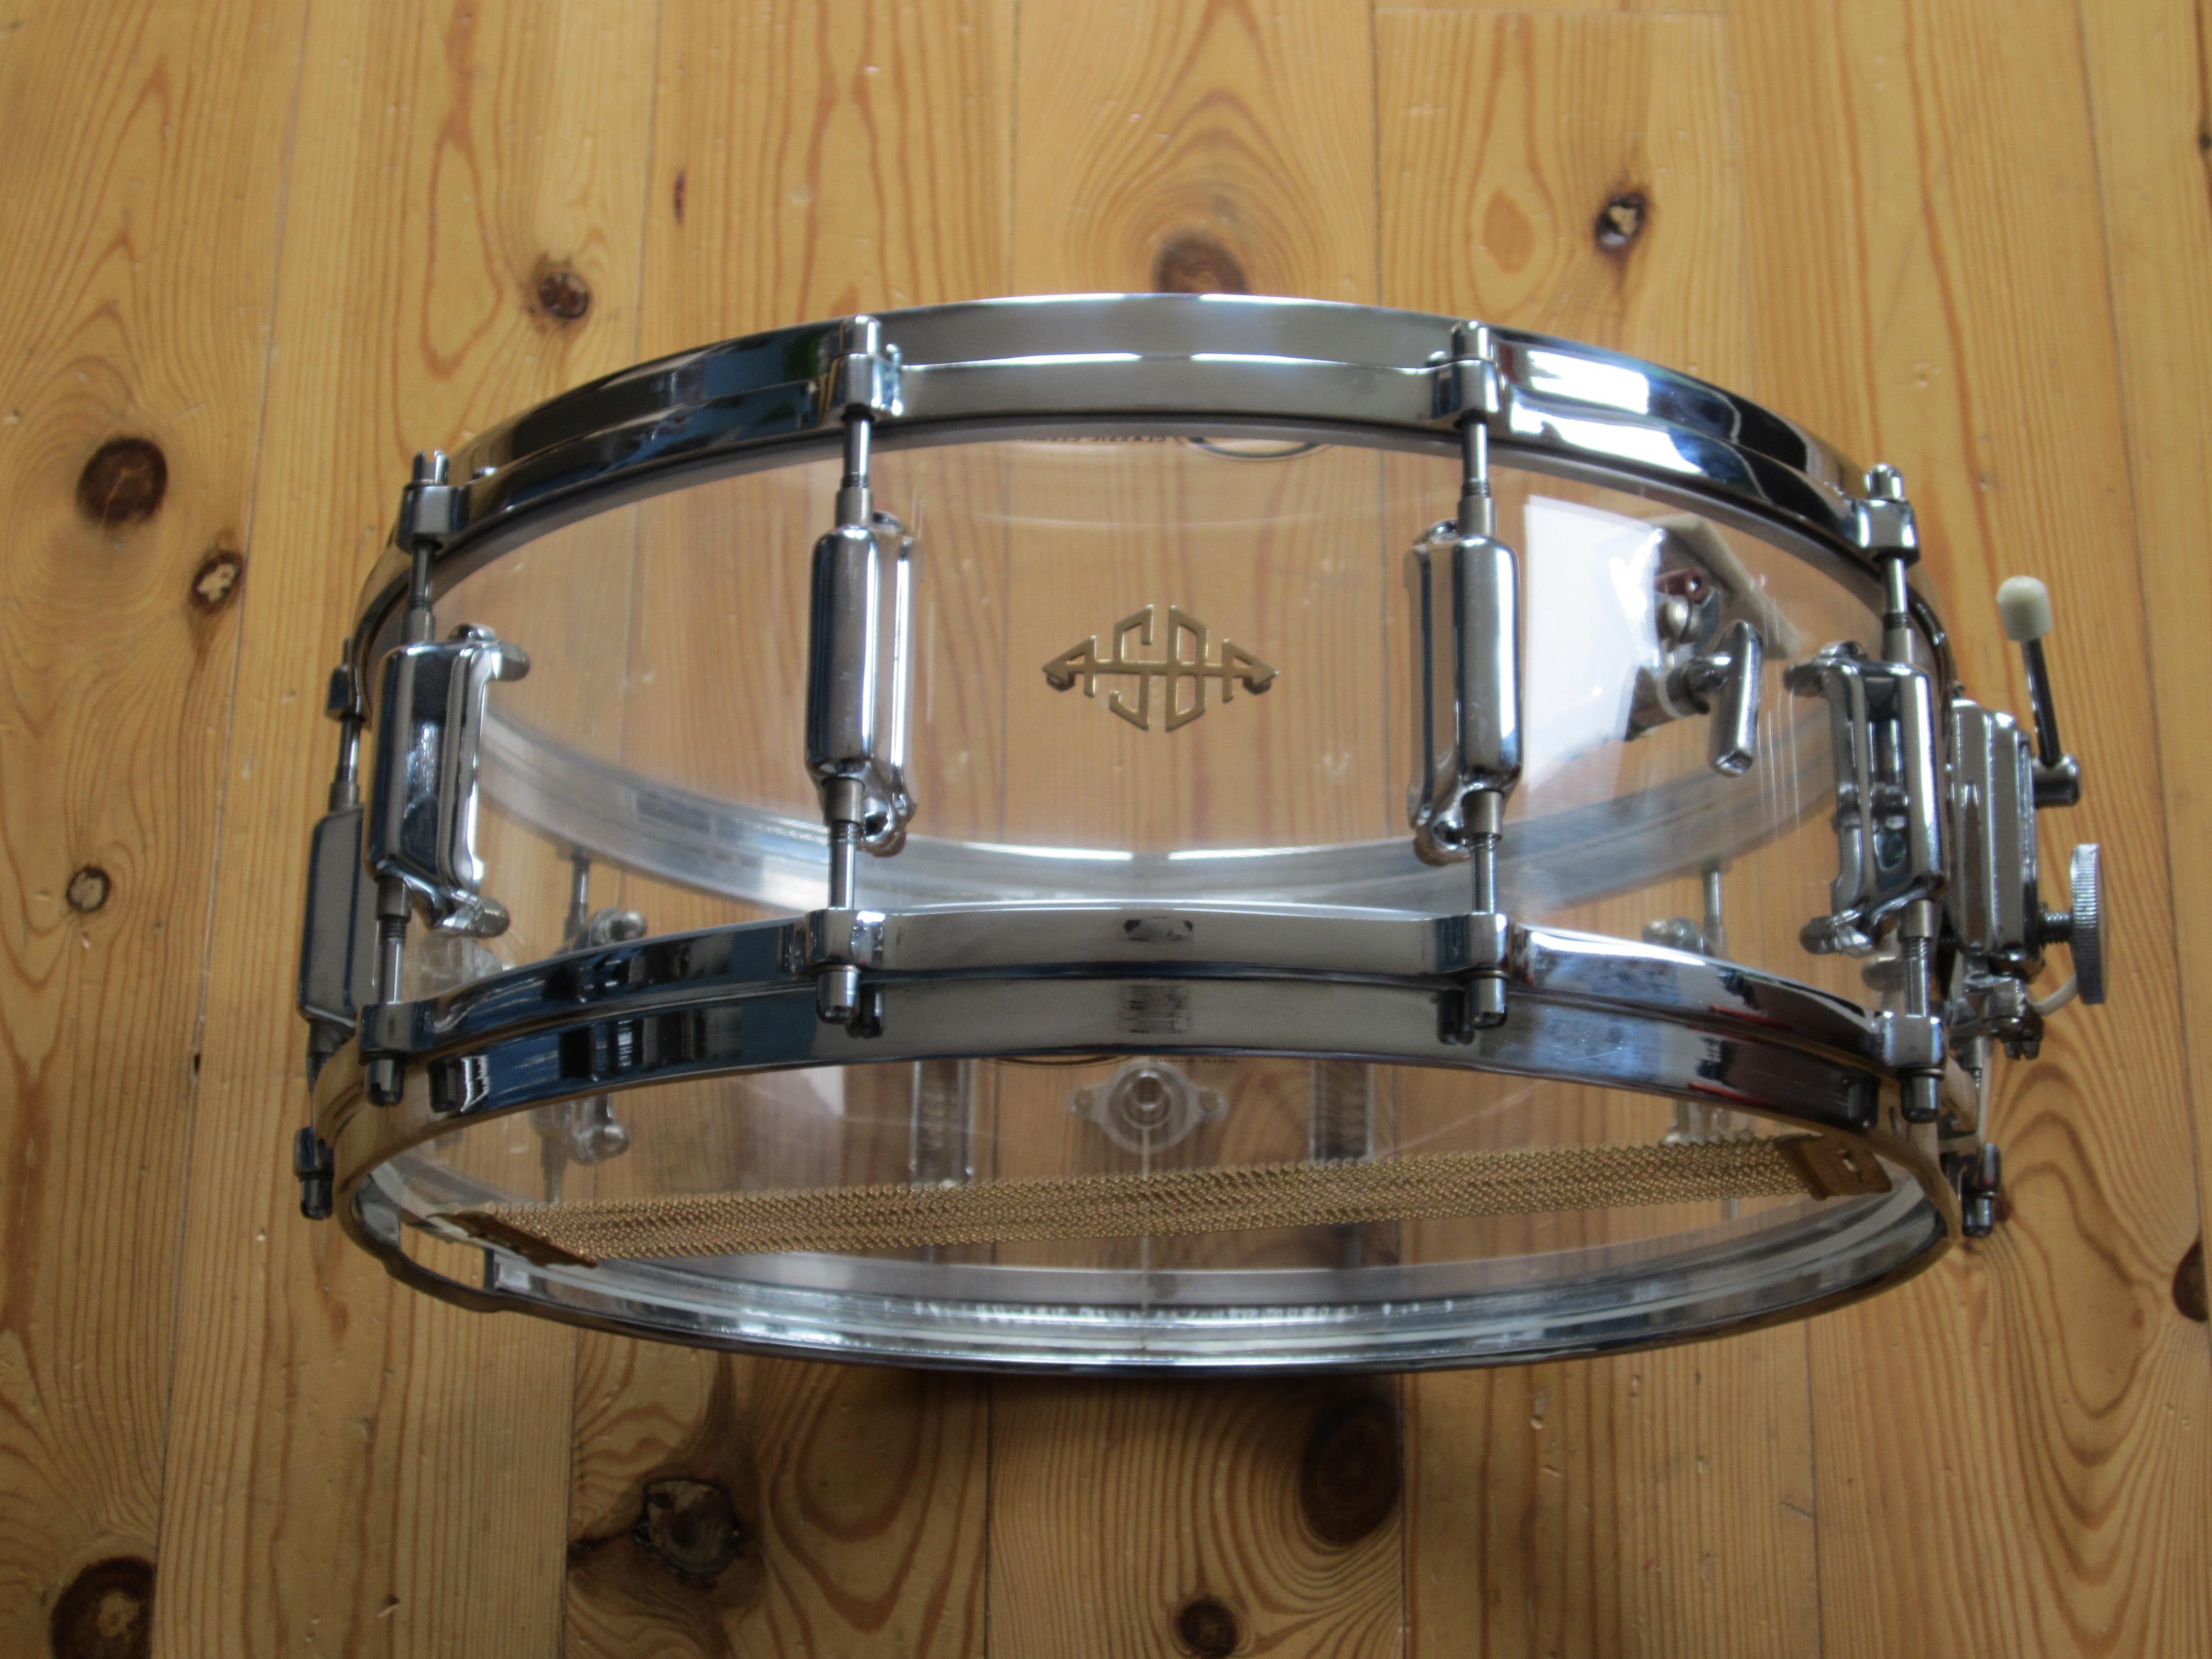 ASBA 743A 14x5 Acryl Design Sound snare drum